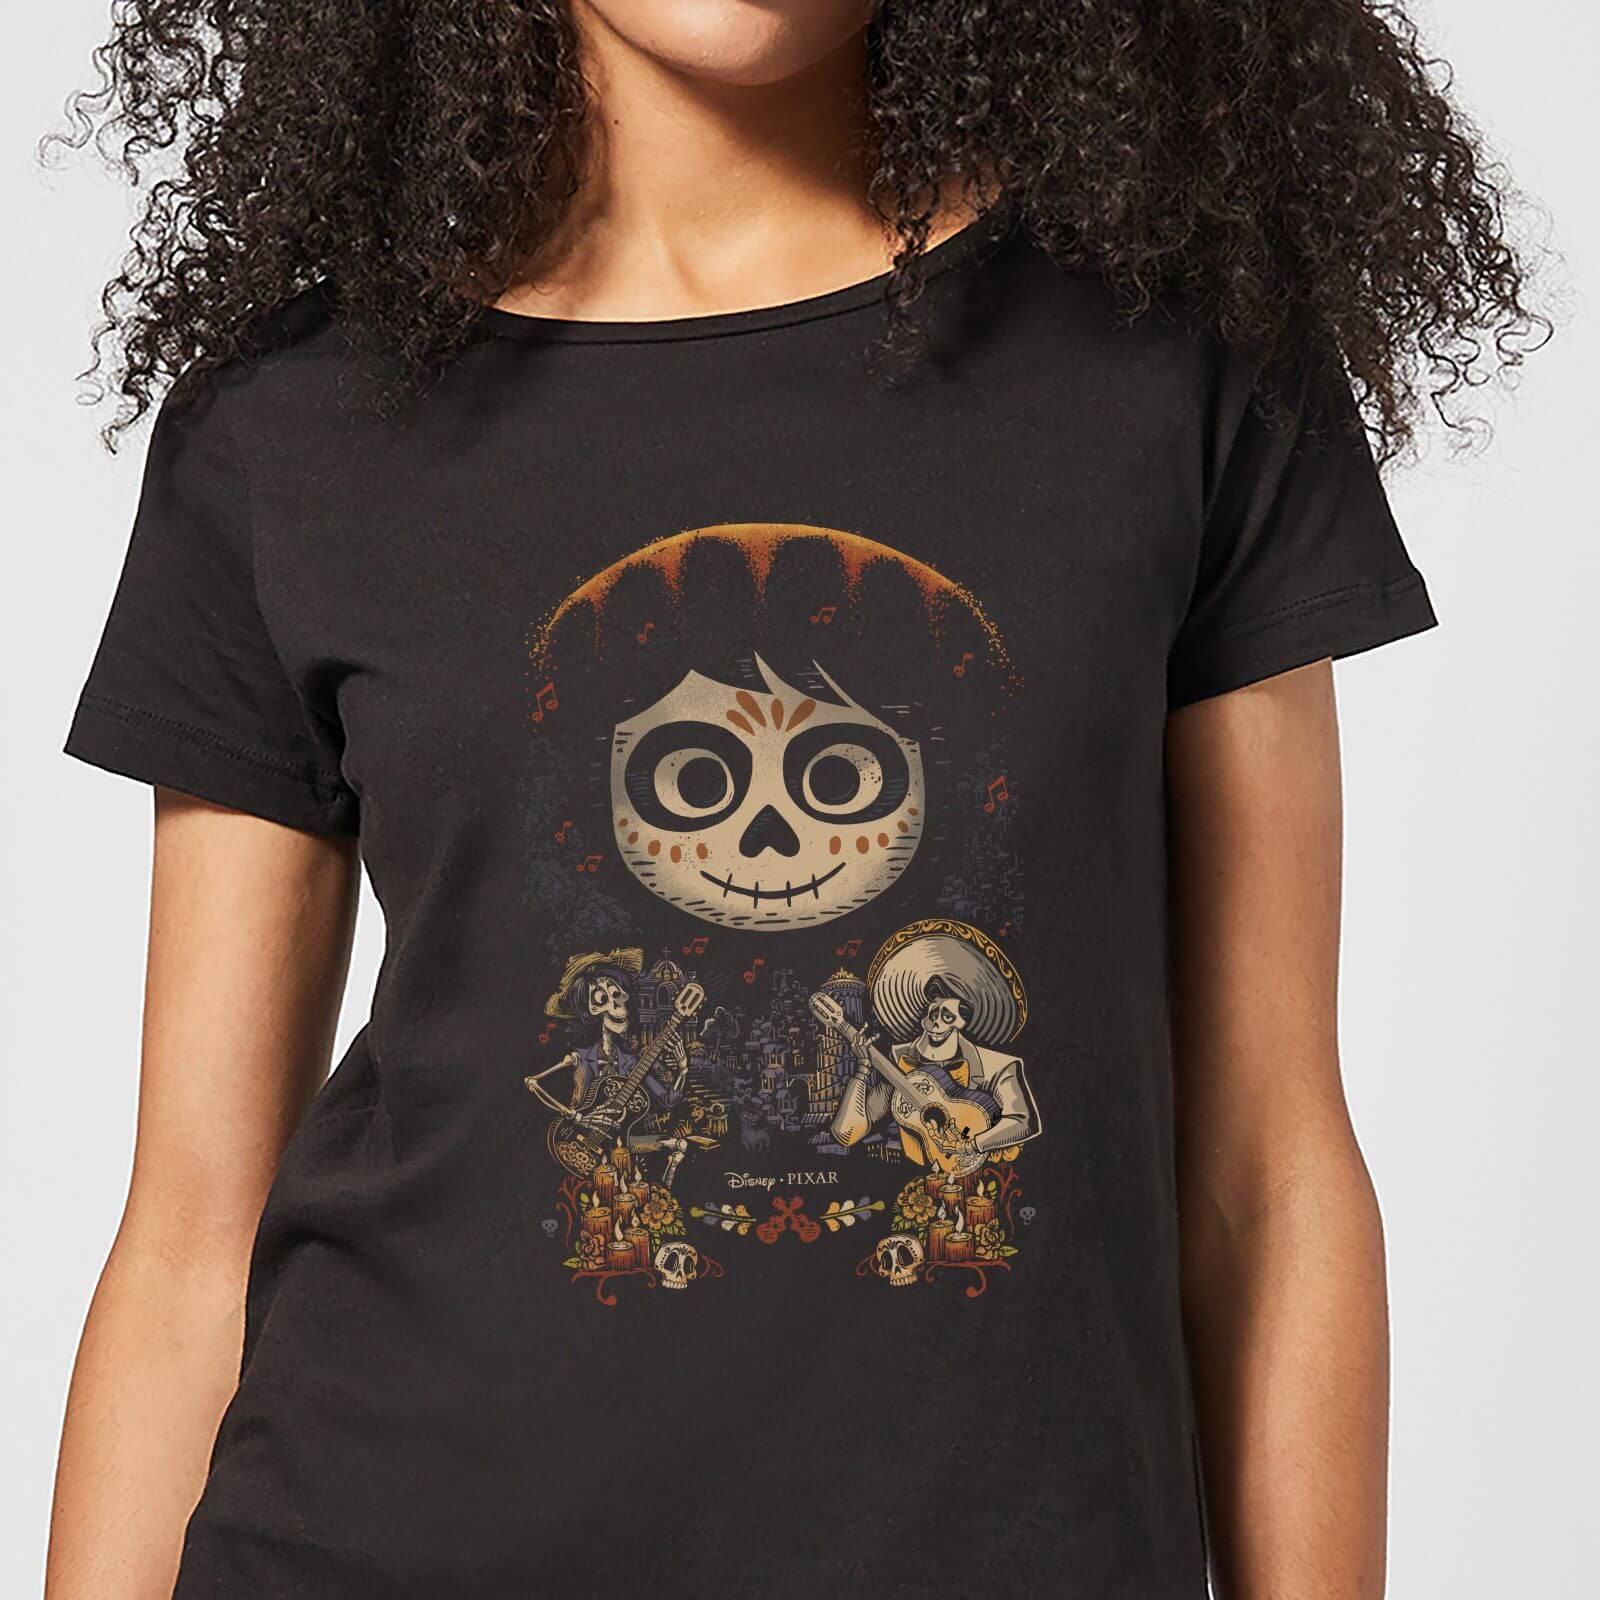 Disney Coco Miguel Face Poster Women's T-Shirt - Black - XS - Black